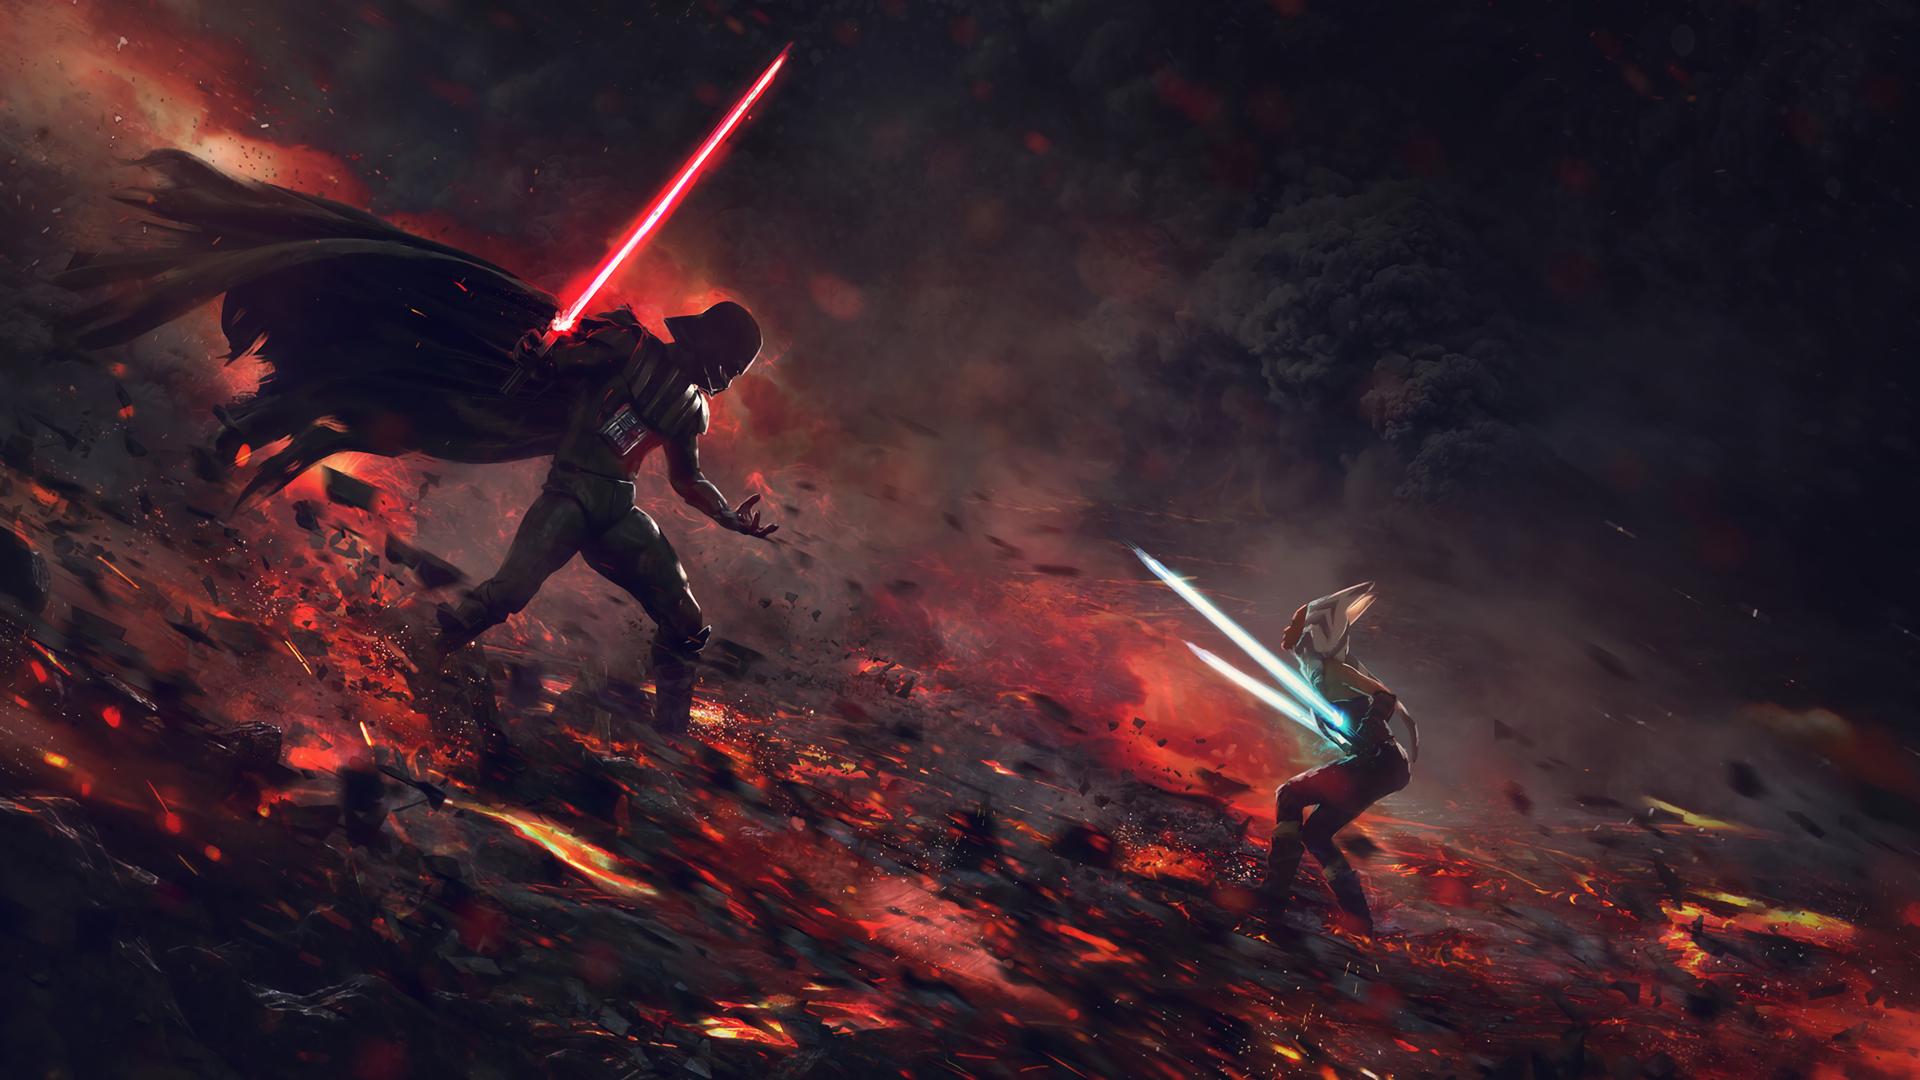 Films Star Wars Darth Vader Ahsoka Tano Fond D Ecran Illustrations De Star Wars Fond D Ecran Star Wars Star Wars